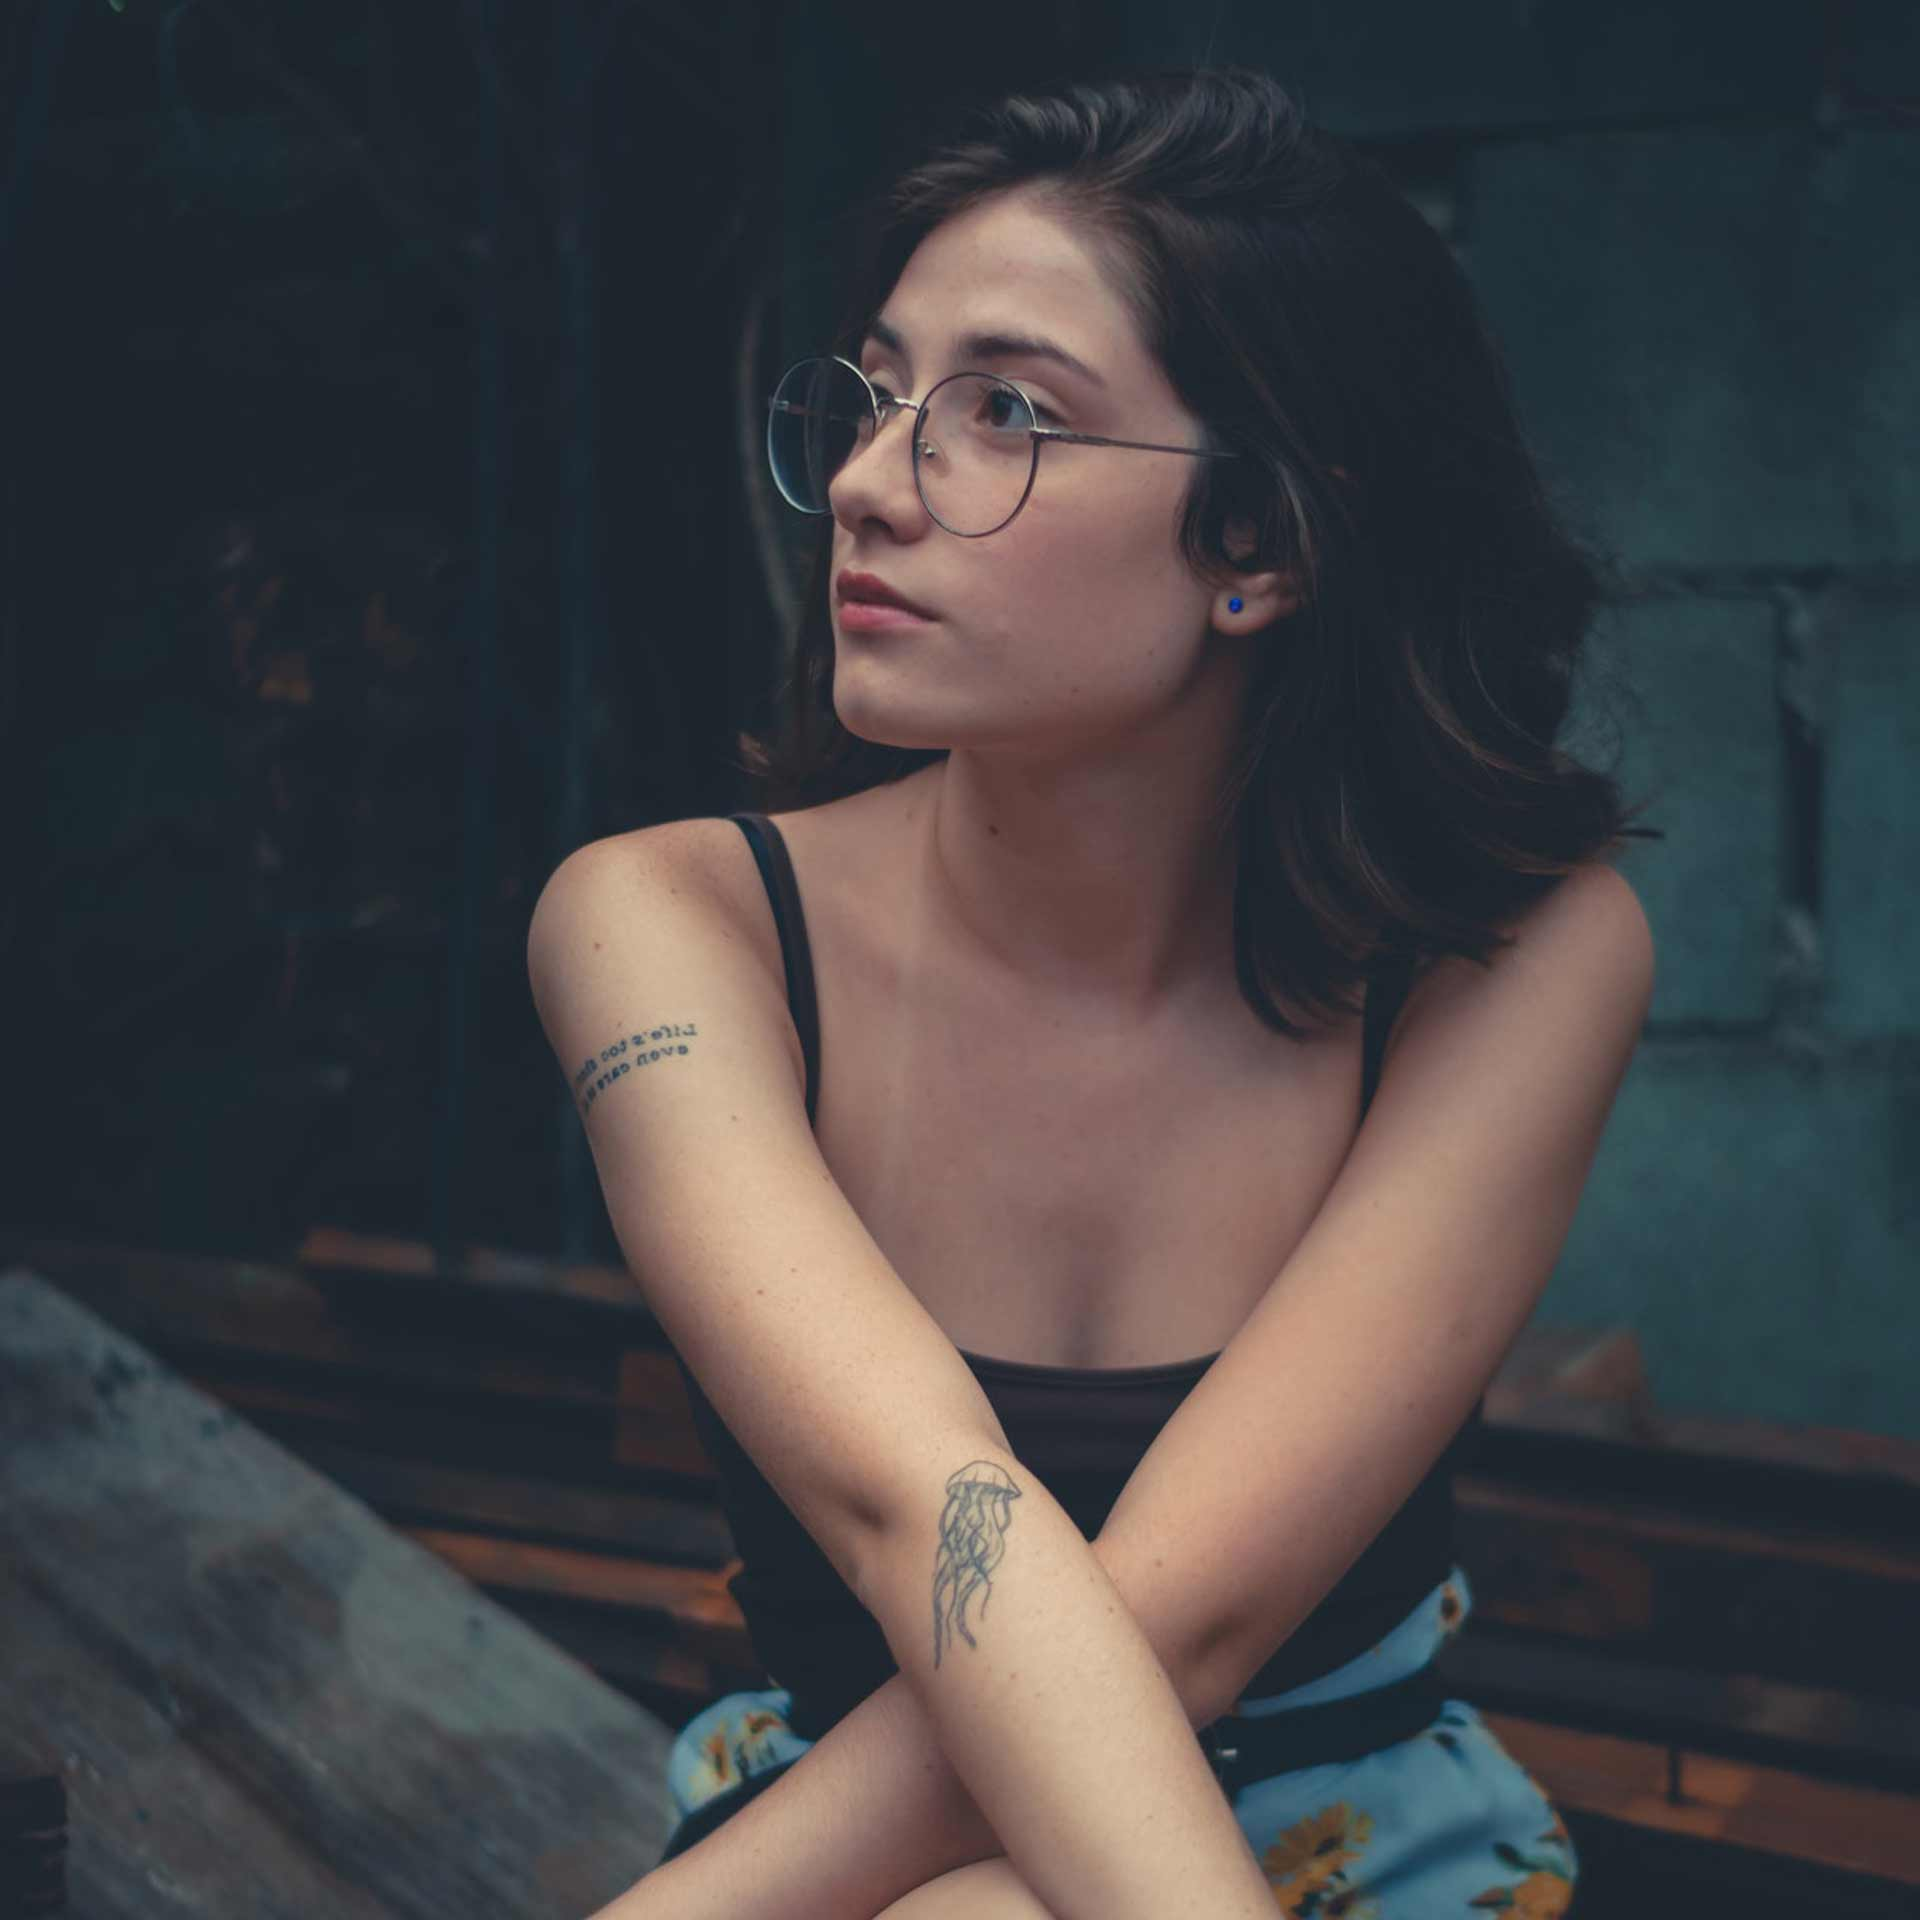 woman-wearing-eyeglasses-on-brown-wooden-plank-1845210